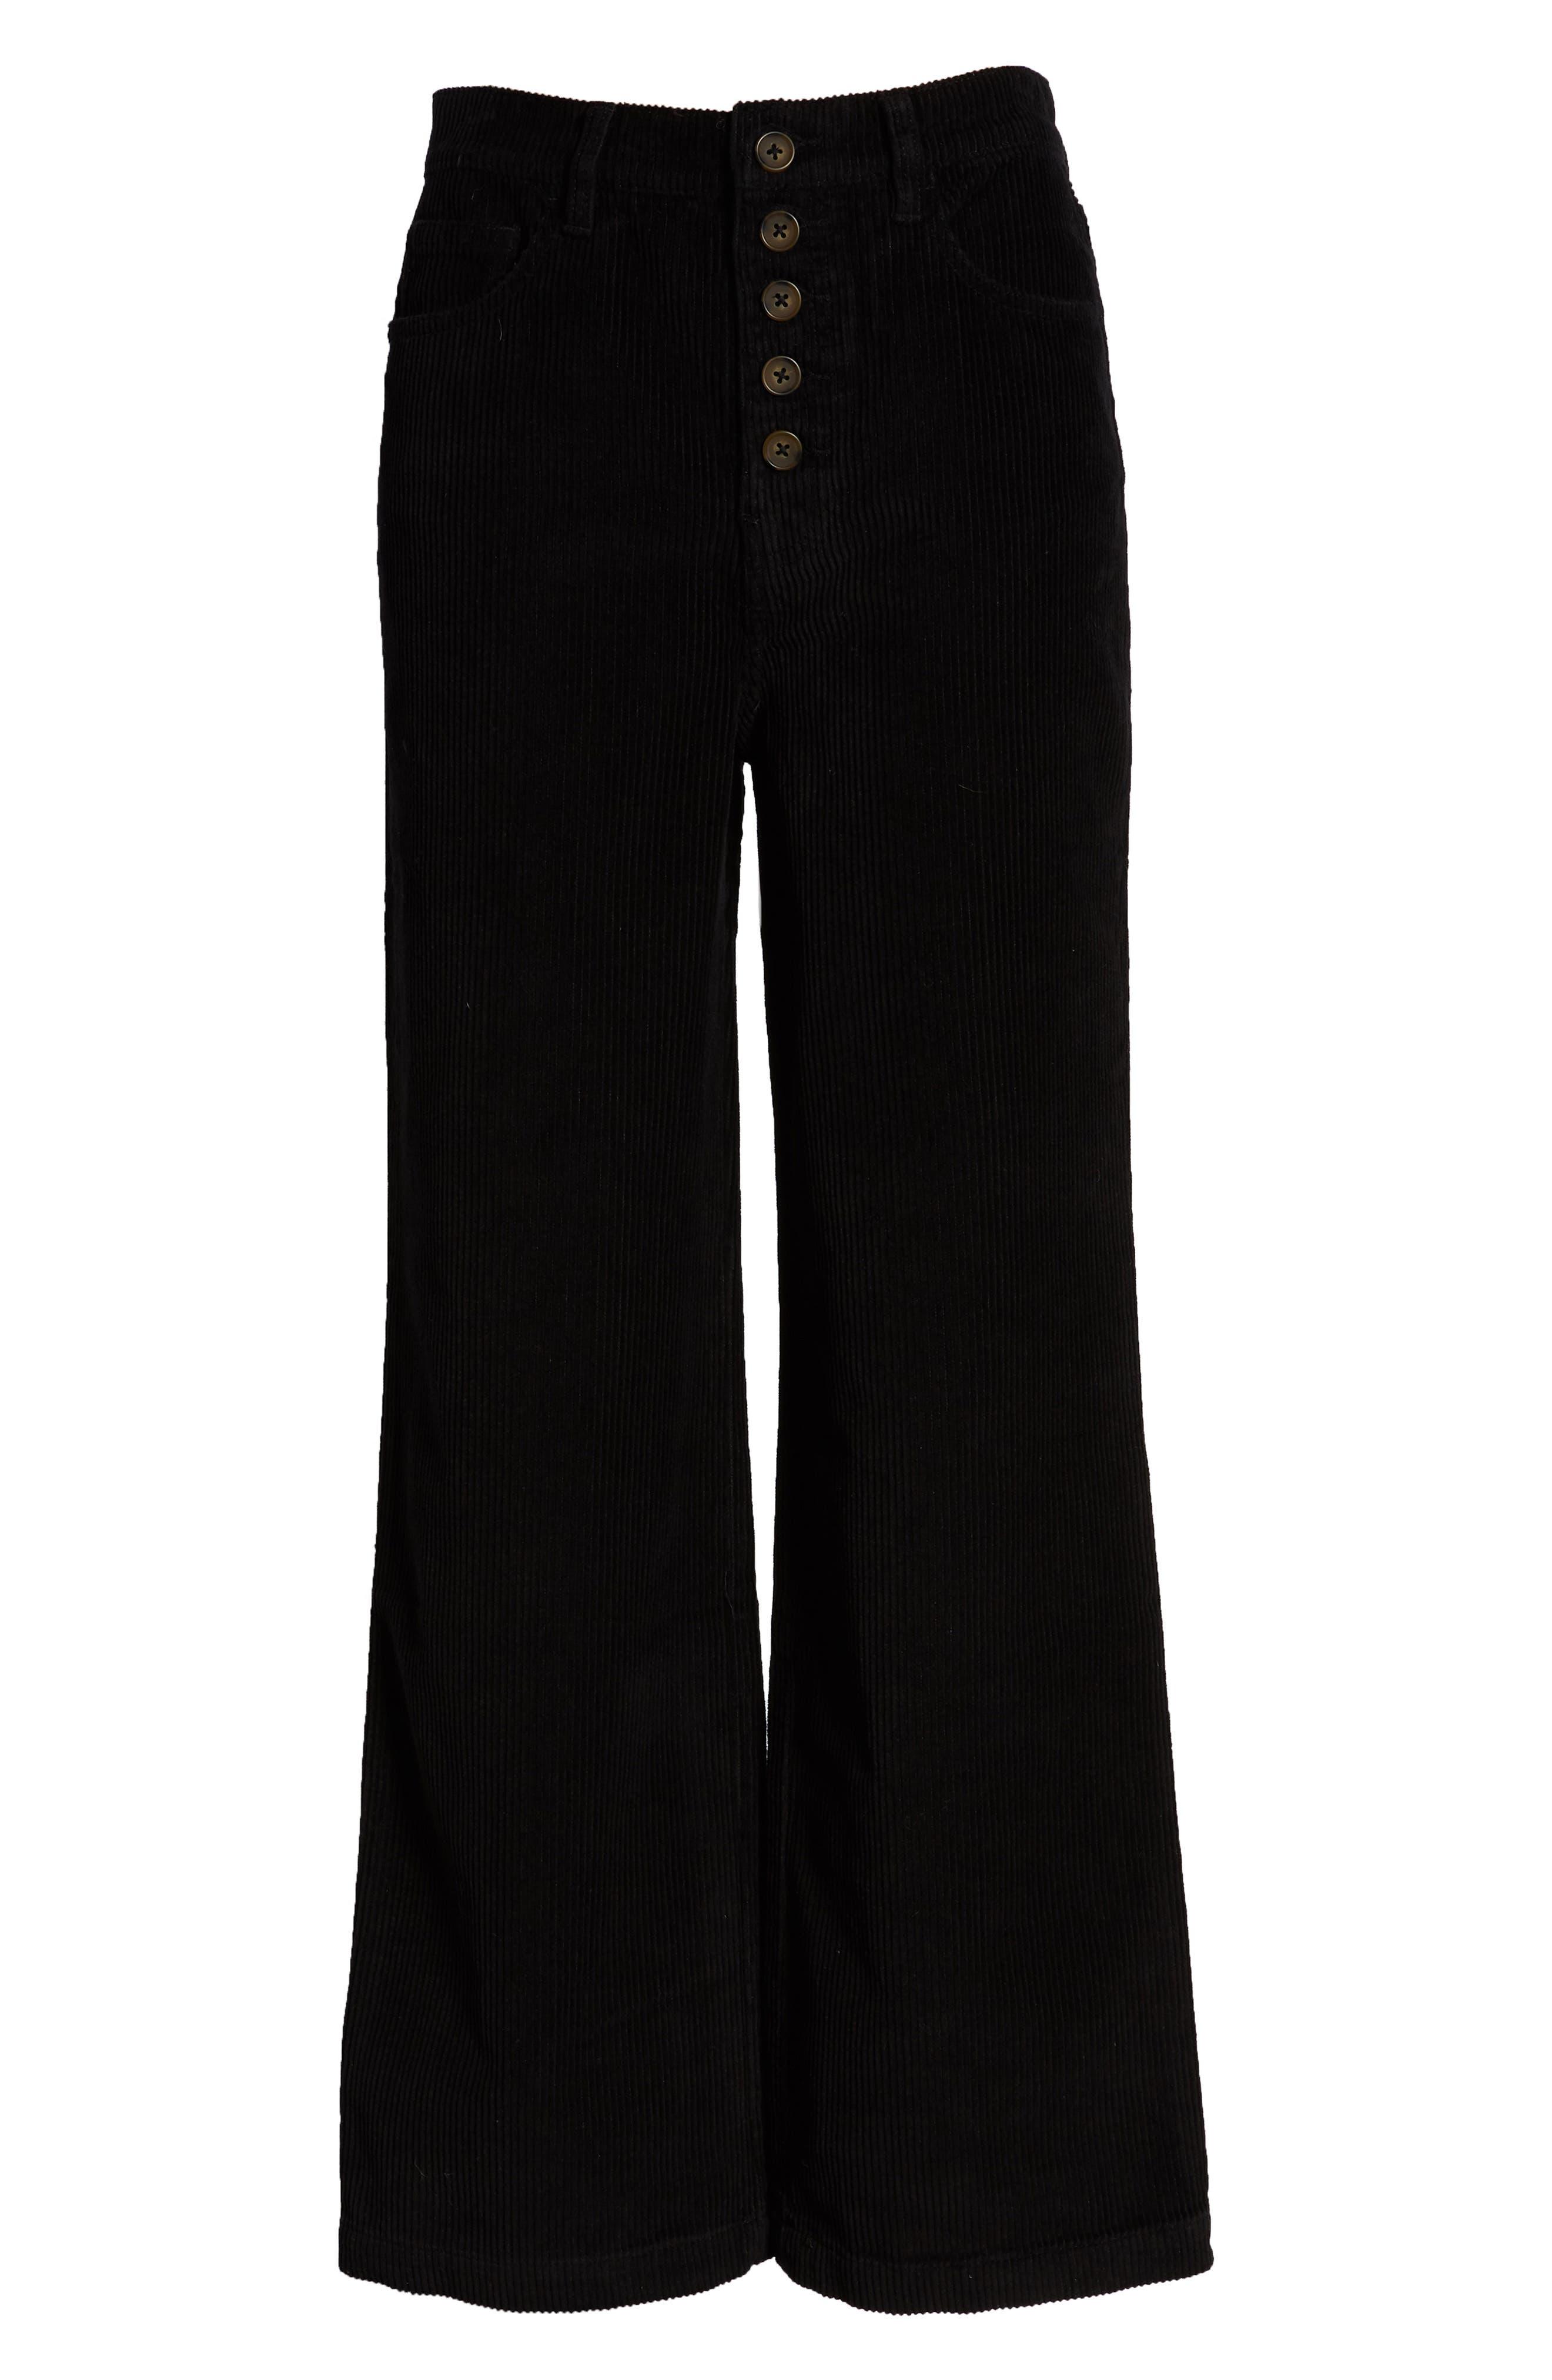 Austin Button Fly Corduroy Pants,                             Alternate thumbnail 6, color,                             BLACK